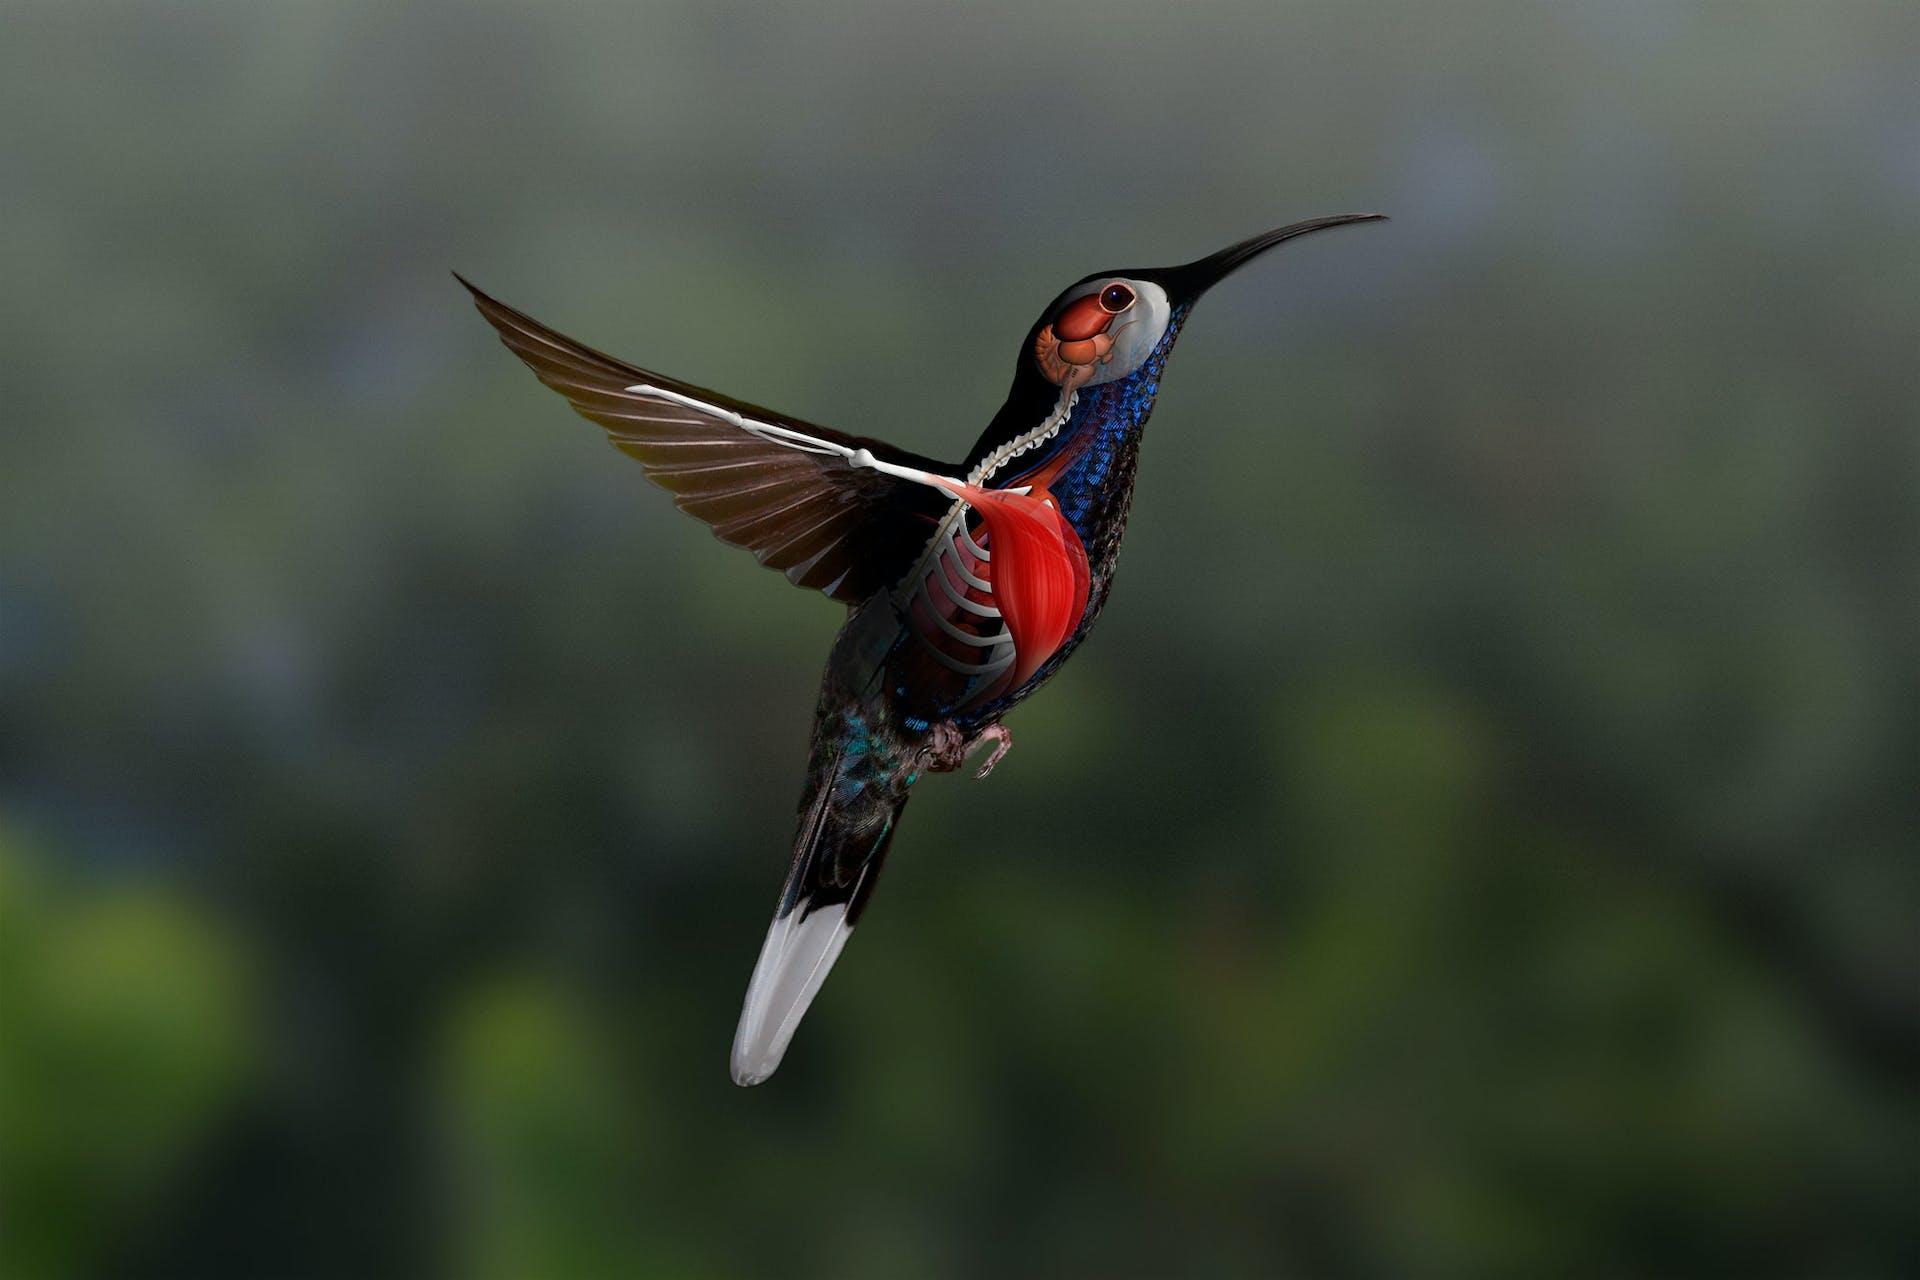 Kolibriens brystmuskler